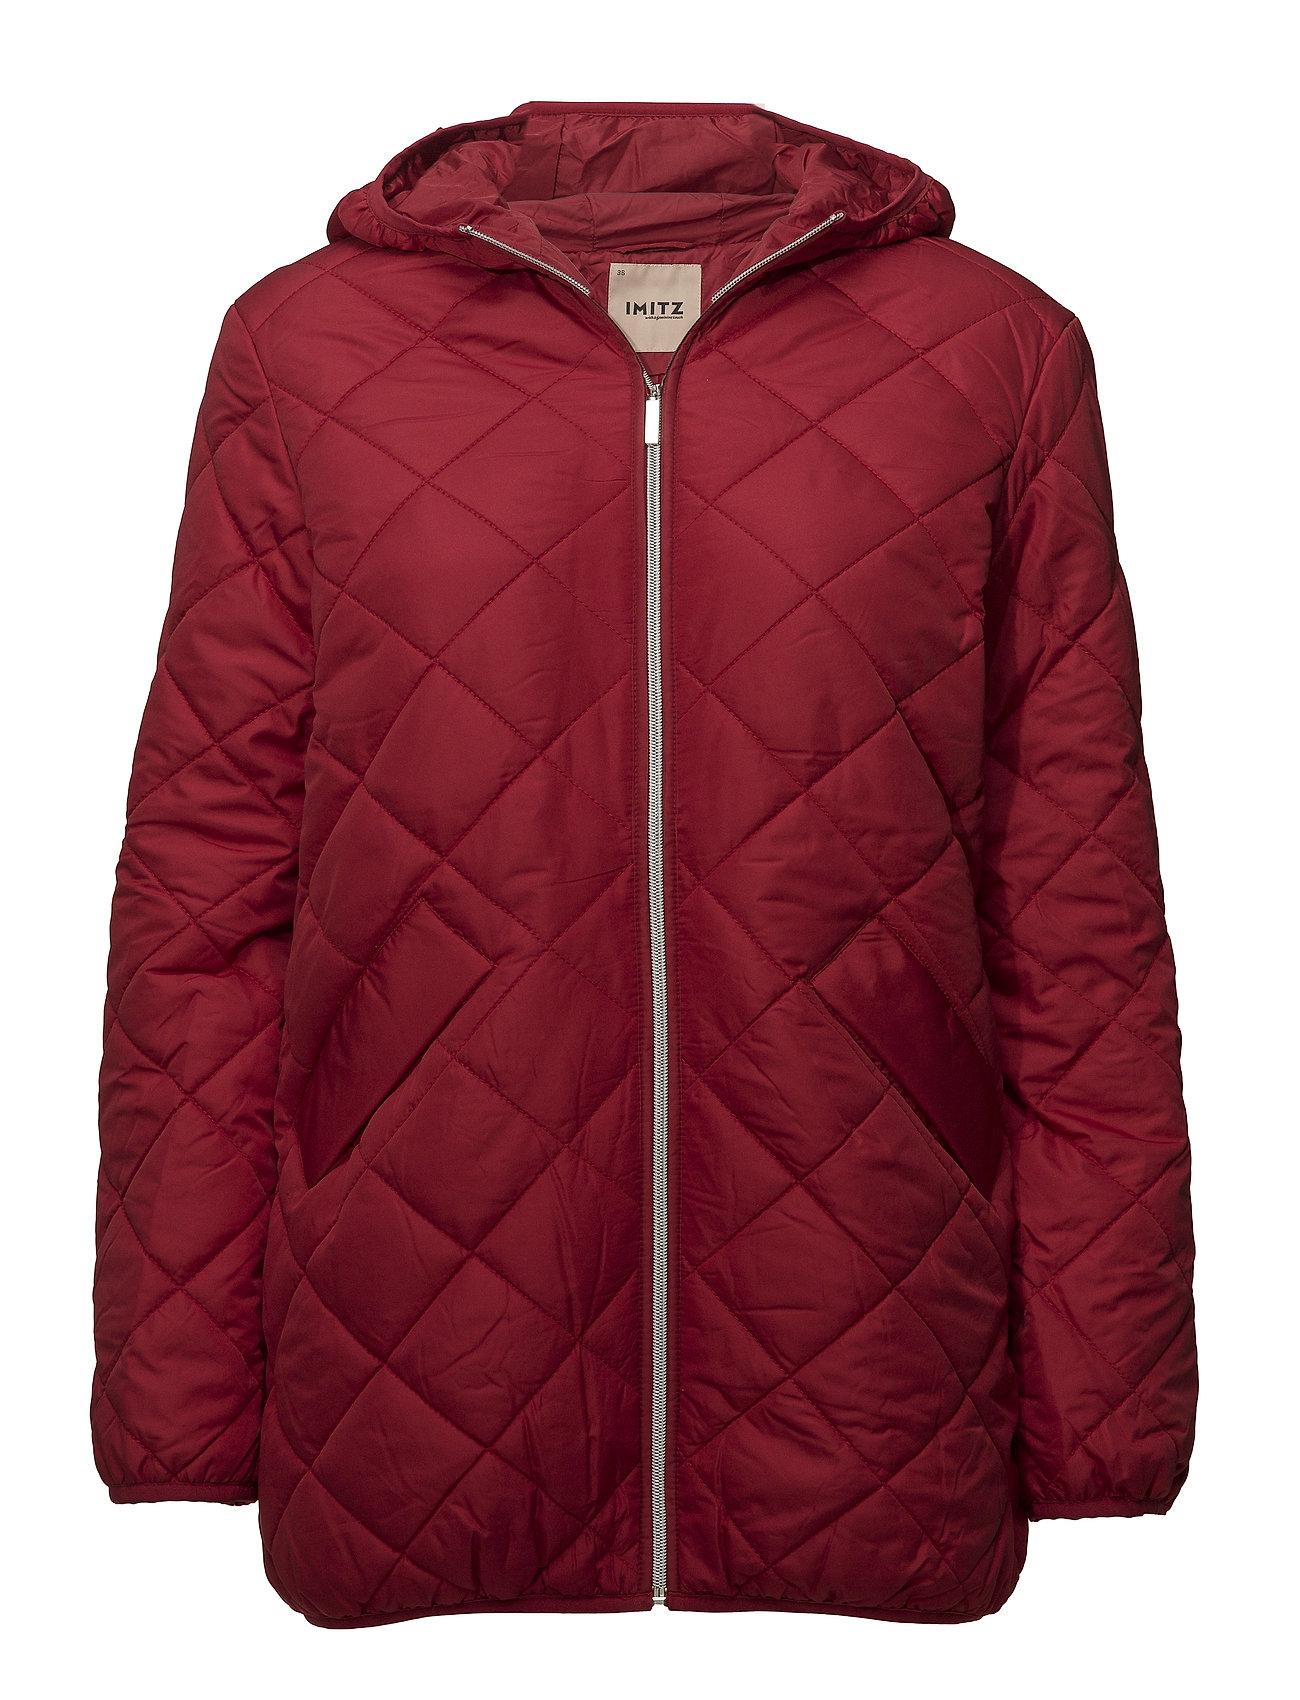 Imitz Jacket Outerwear Light - RED CHILI